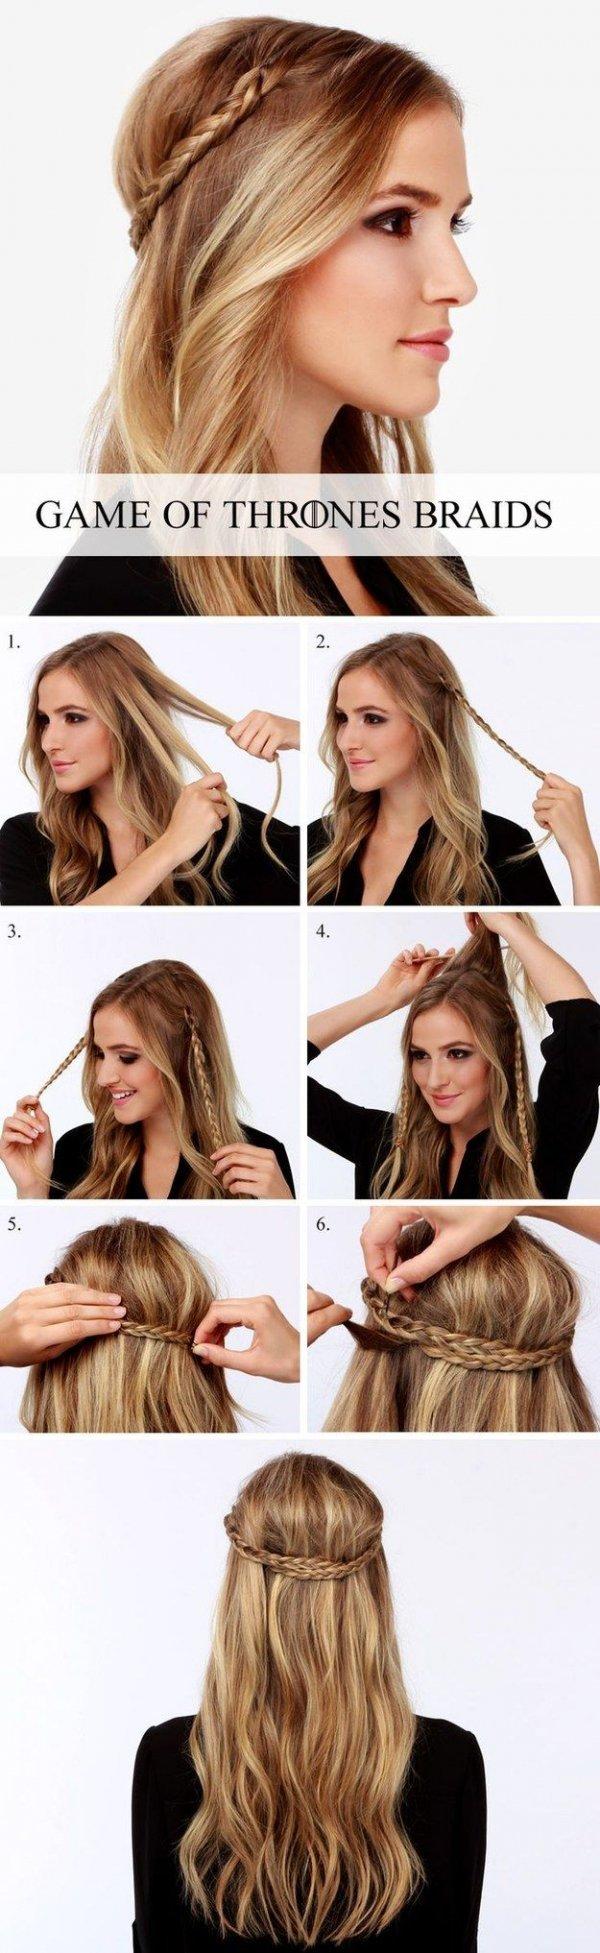 hair,clothing,hairstyle,brown,long hair,